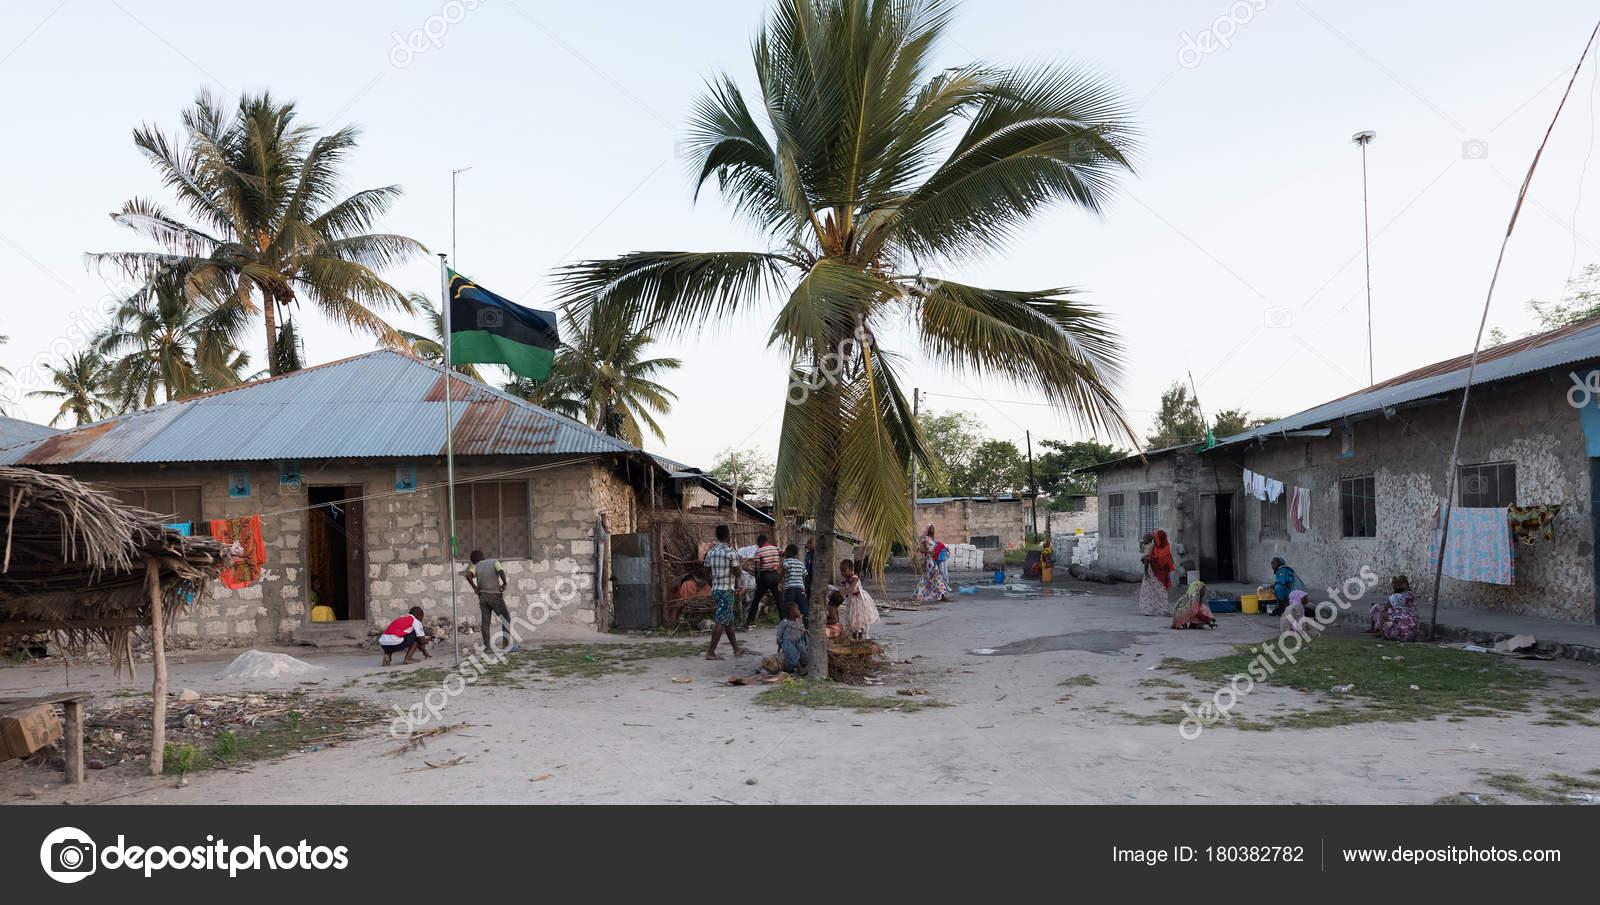 Life in a small village of Zanzibar – Stock Editorial Photo